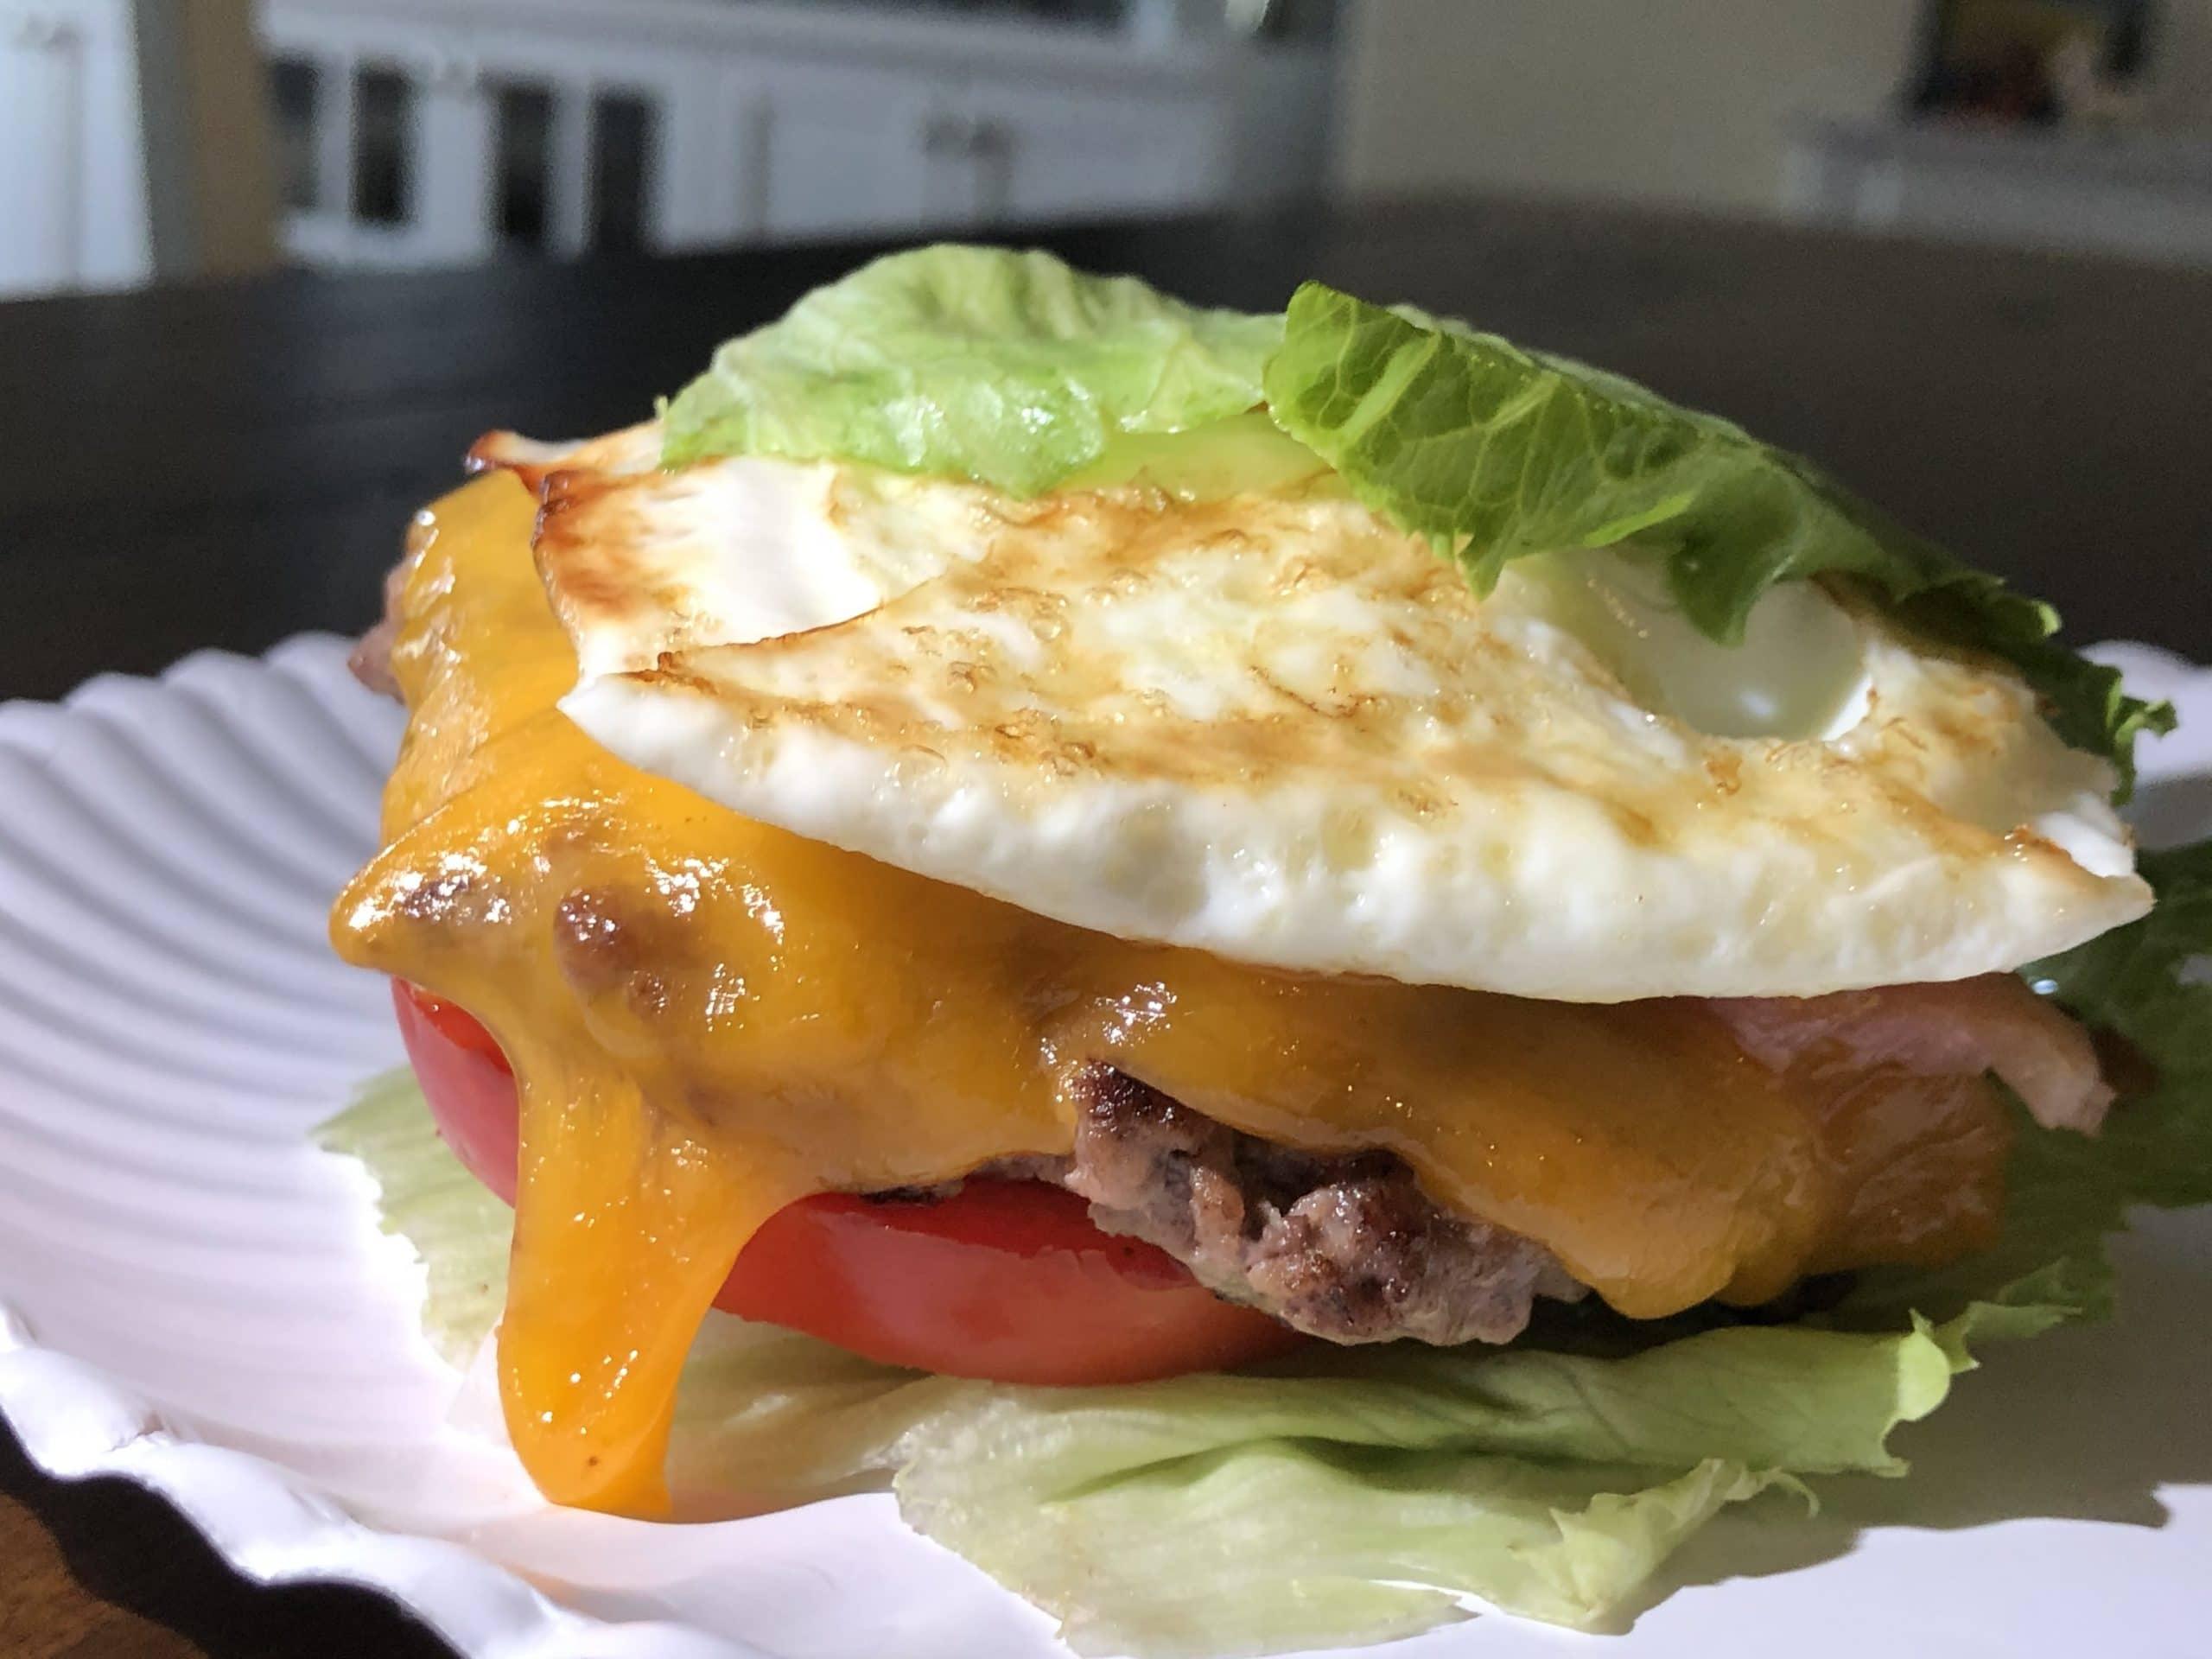 Keto Breakfast Cheeseburger